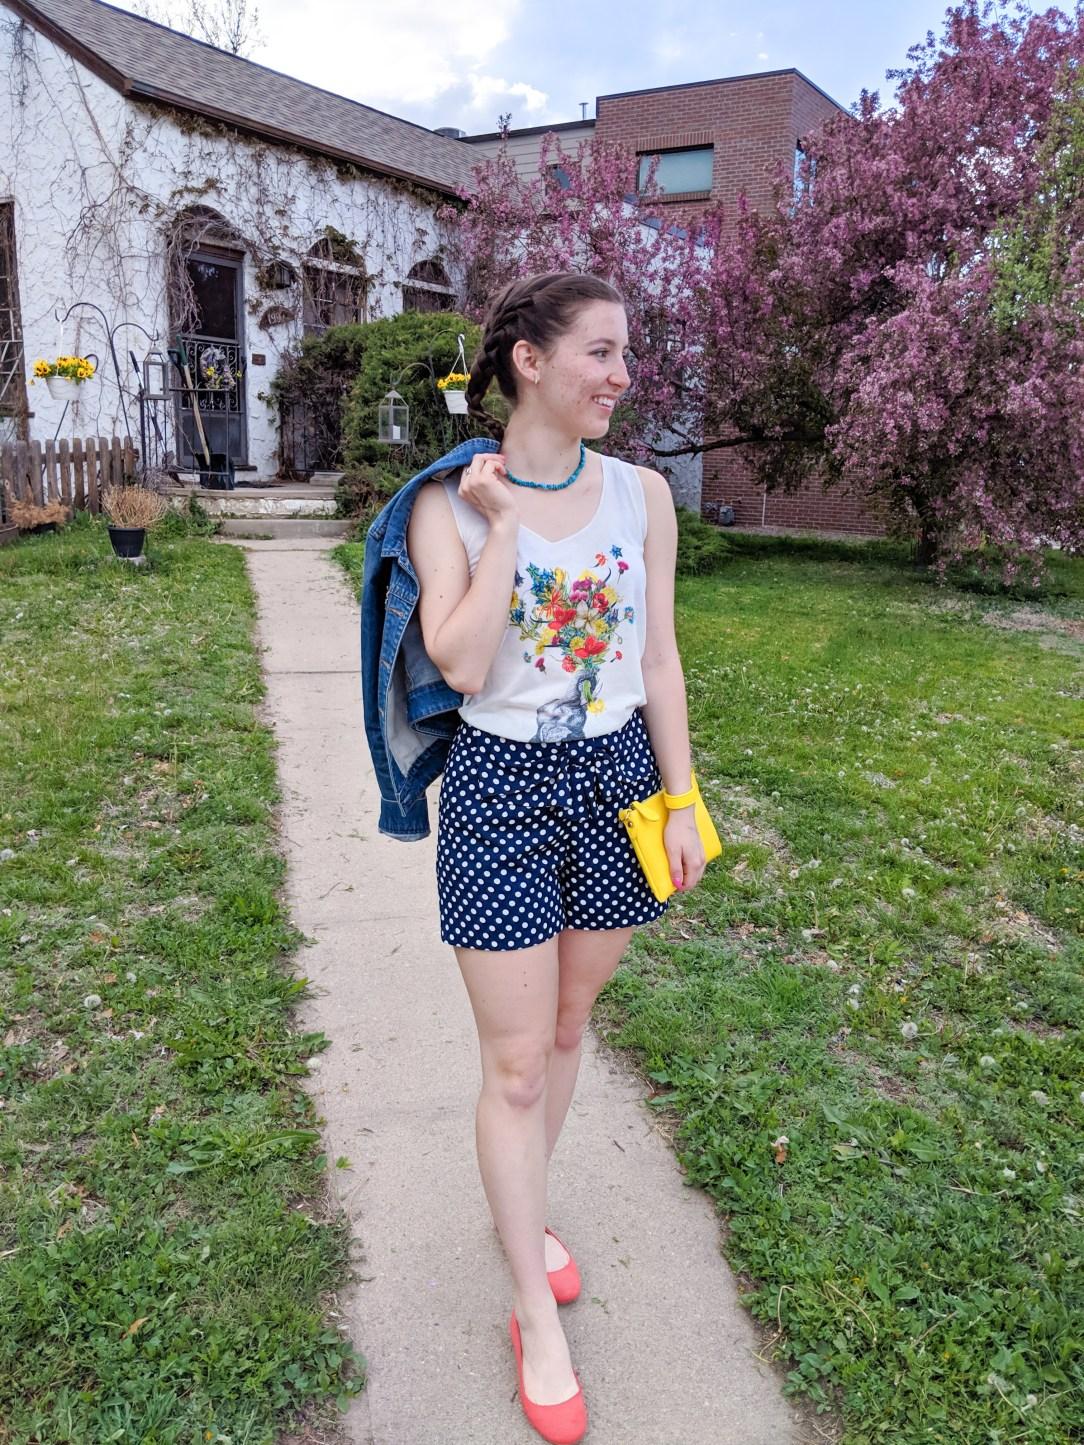 floral graphic tee, yellow purse, orange flats, polka dot shorts